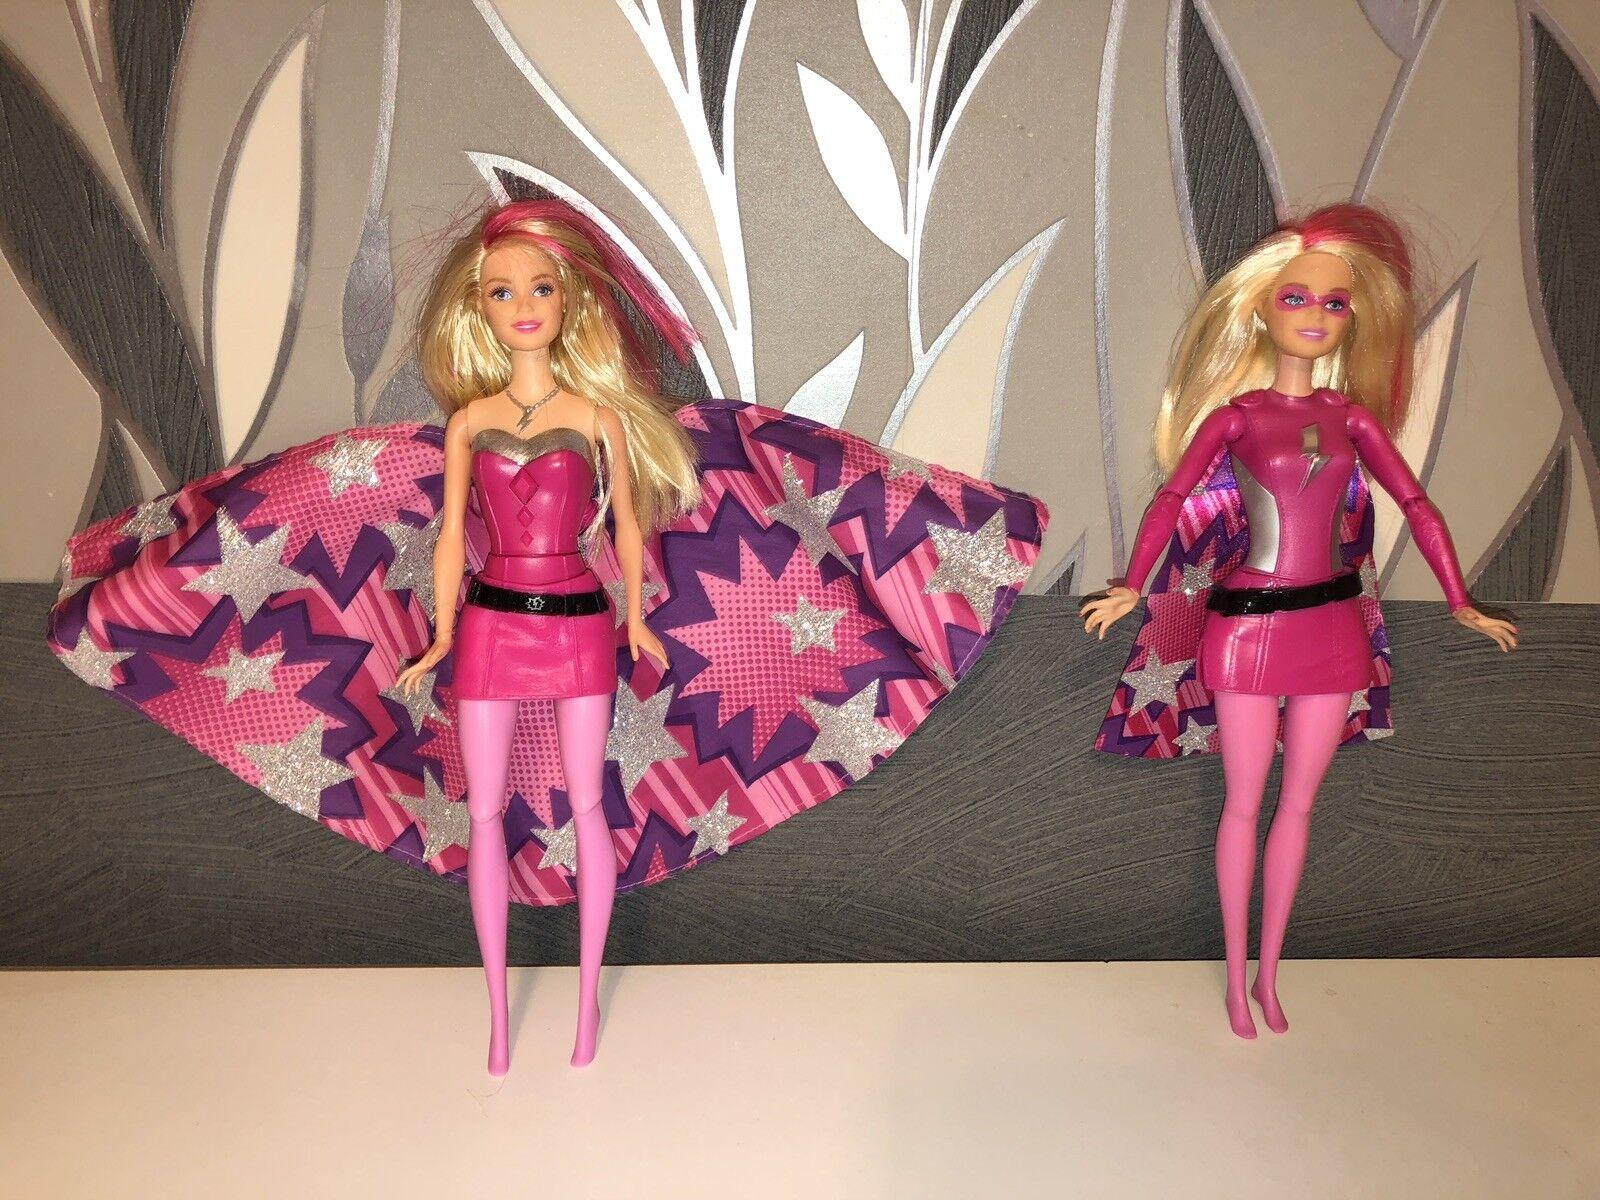 6 Barbie Puppen Paket Konvolut Fashionistas Set Super Prinzessin Dreamtopia Dreamtopia Dreamtopia Rosa 905588